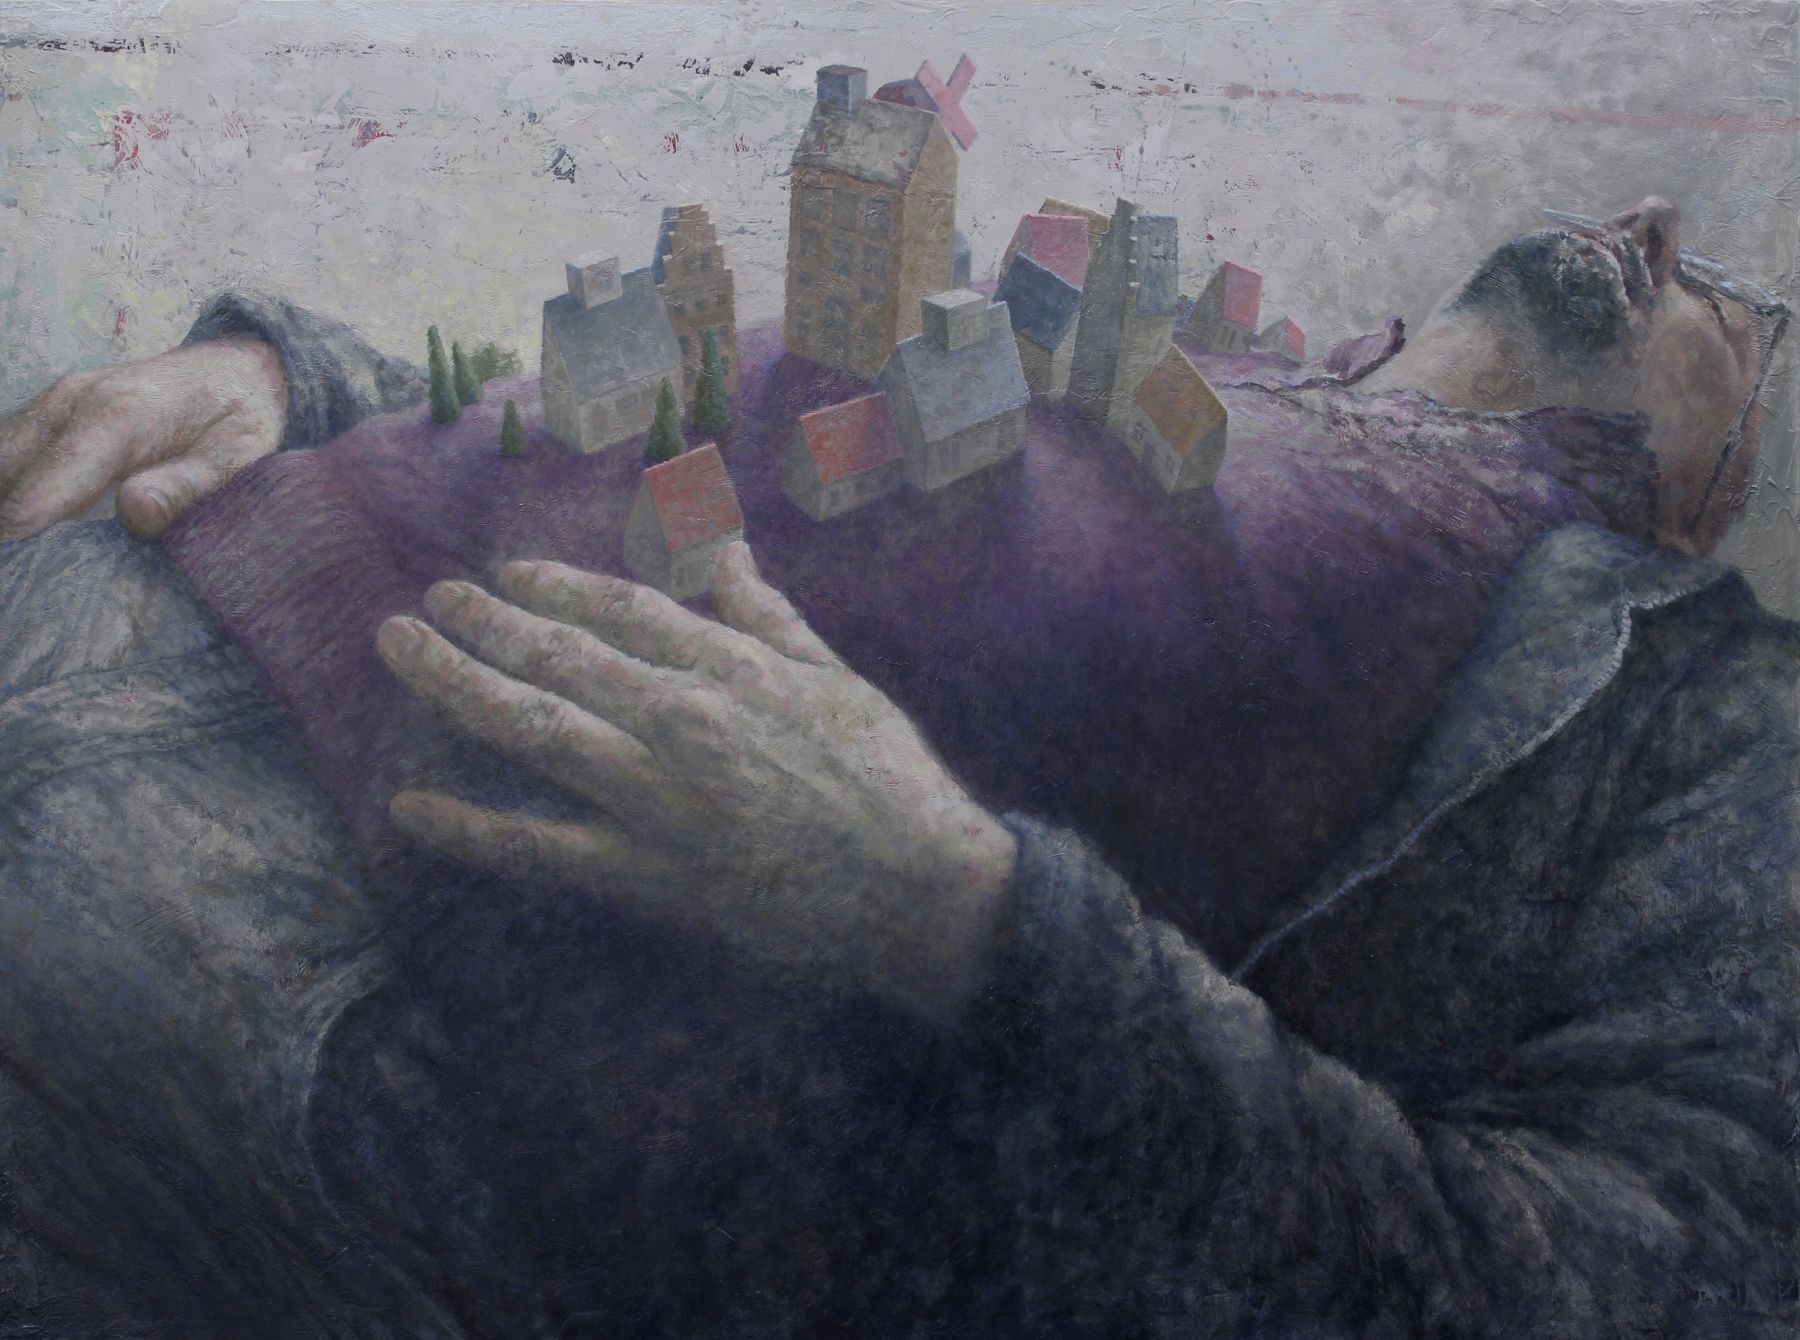 Michèle Fenniak, Town (Portrait of Paul) [SOLD], 2018, oil on panel, 17 3/4 x 23 3/4 inches